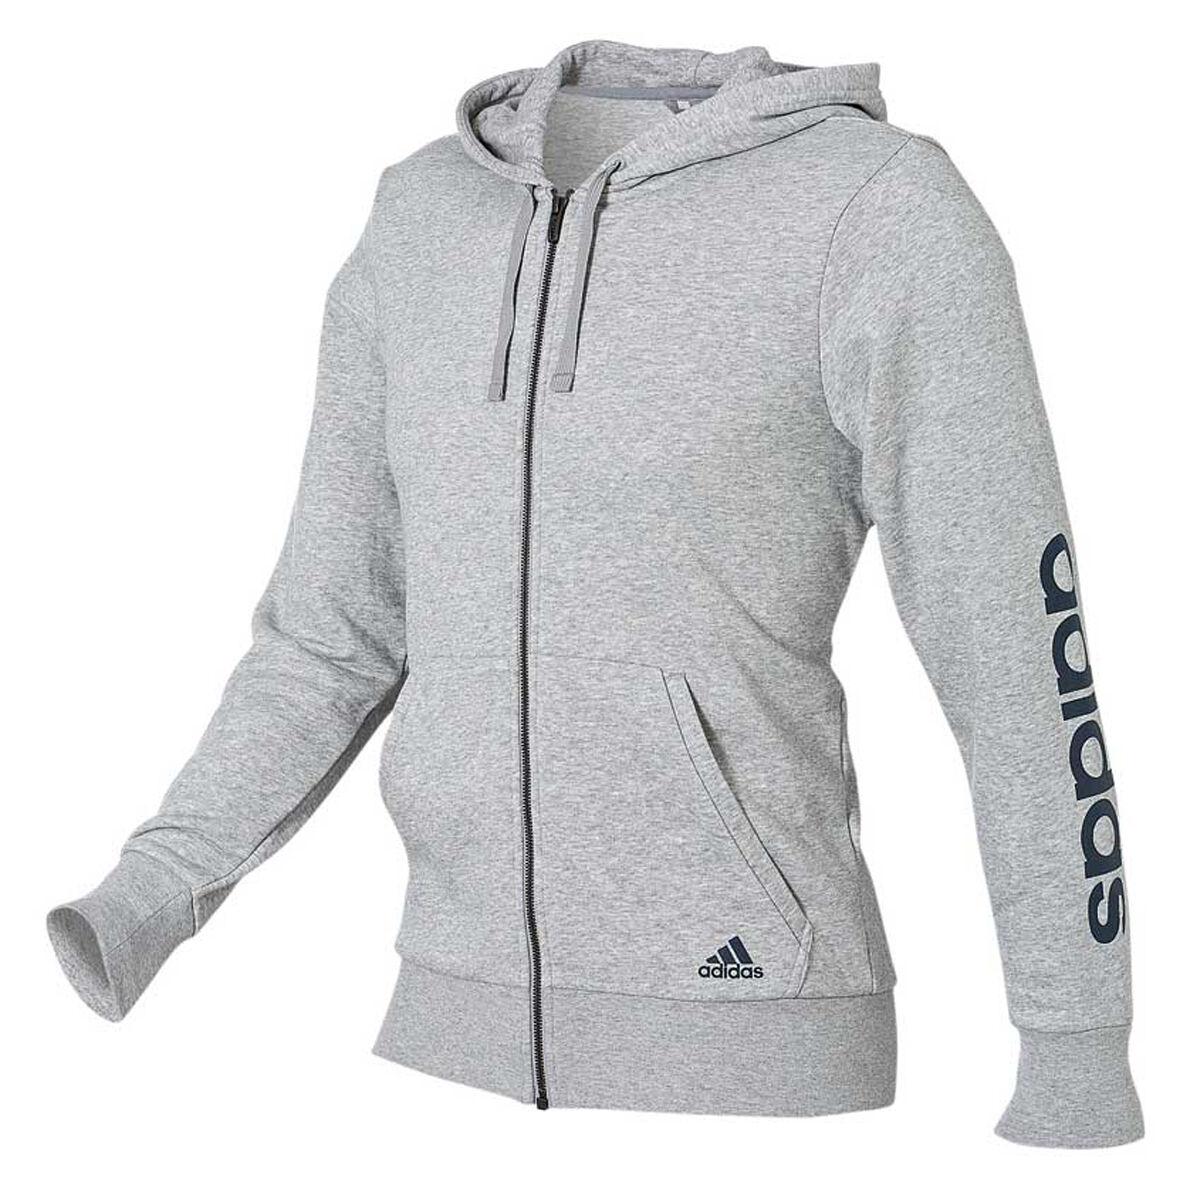 ce17861eaa88 ... white 852457 002 9967c a3044  australia adidas mens essentials linear  hoodie grey s adult grey rebelhi res f220c 8b88f